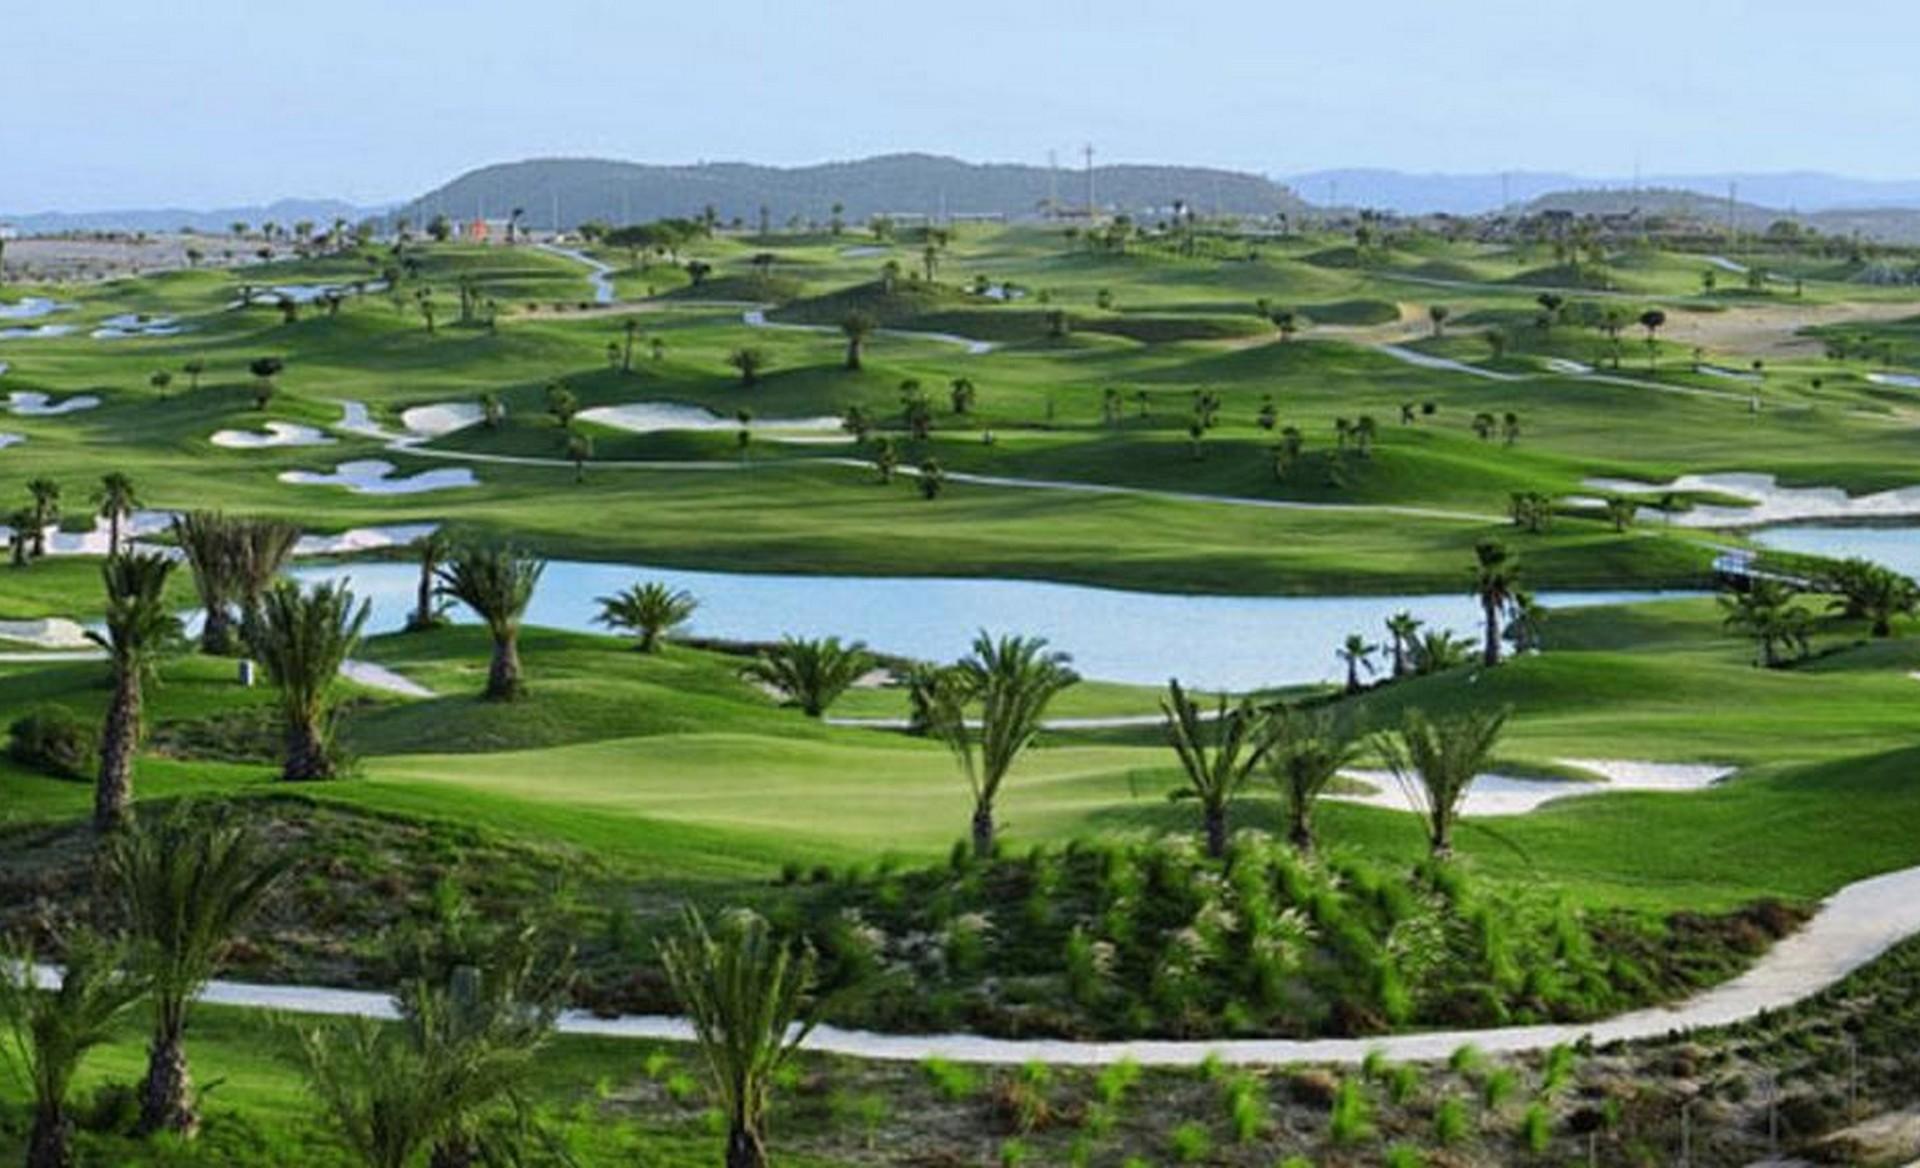 Orihuela-Costa golf